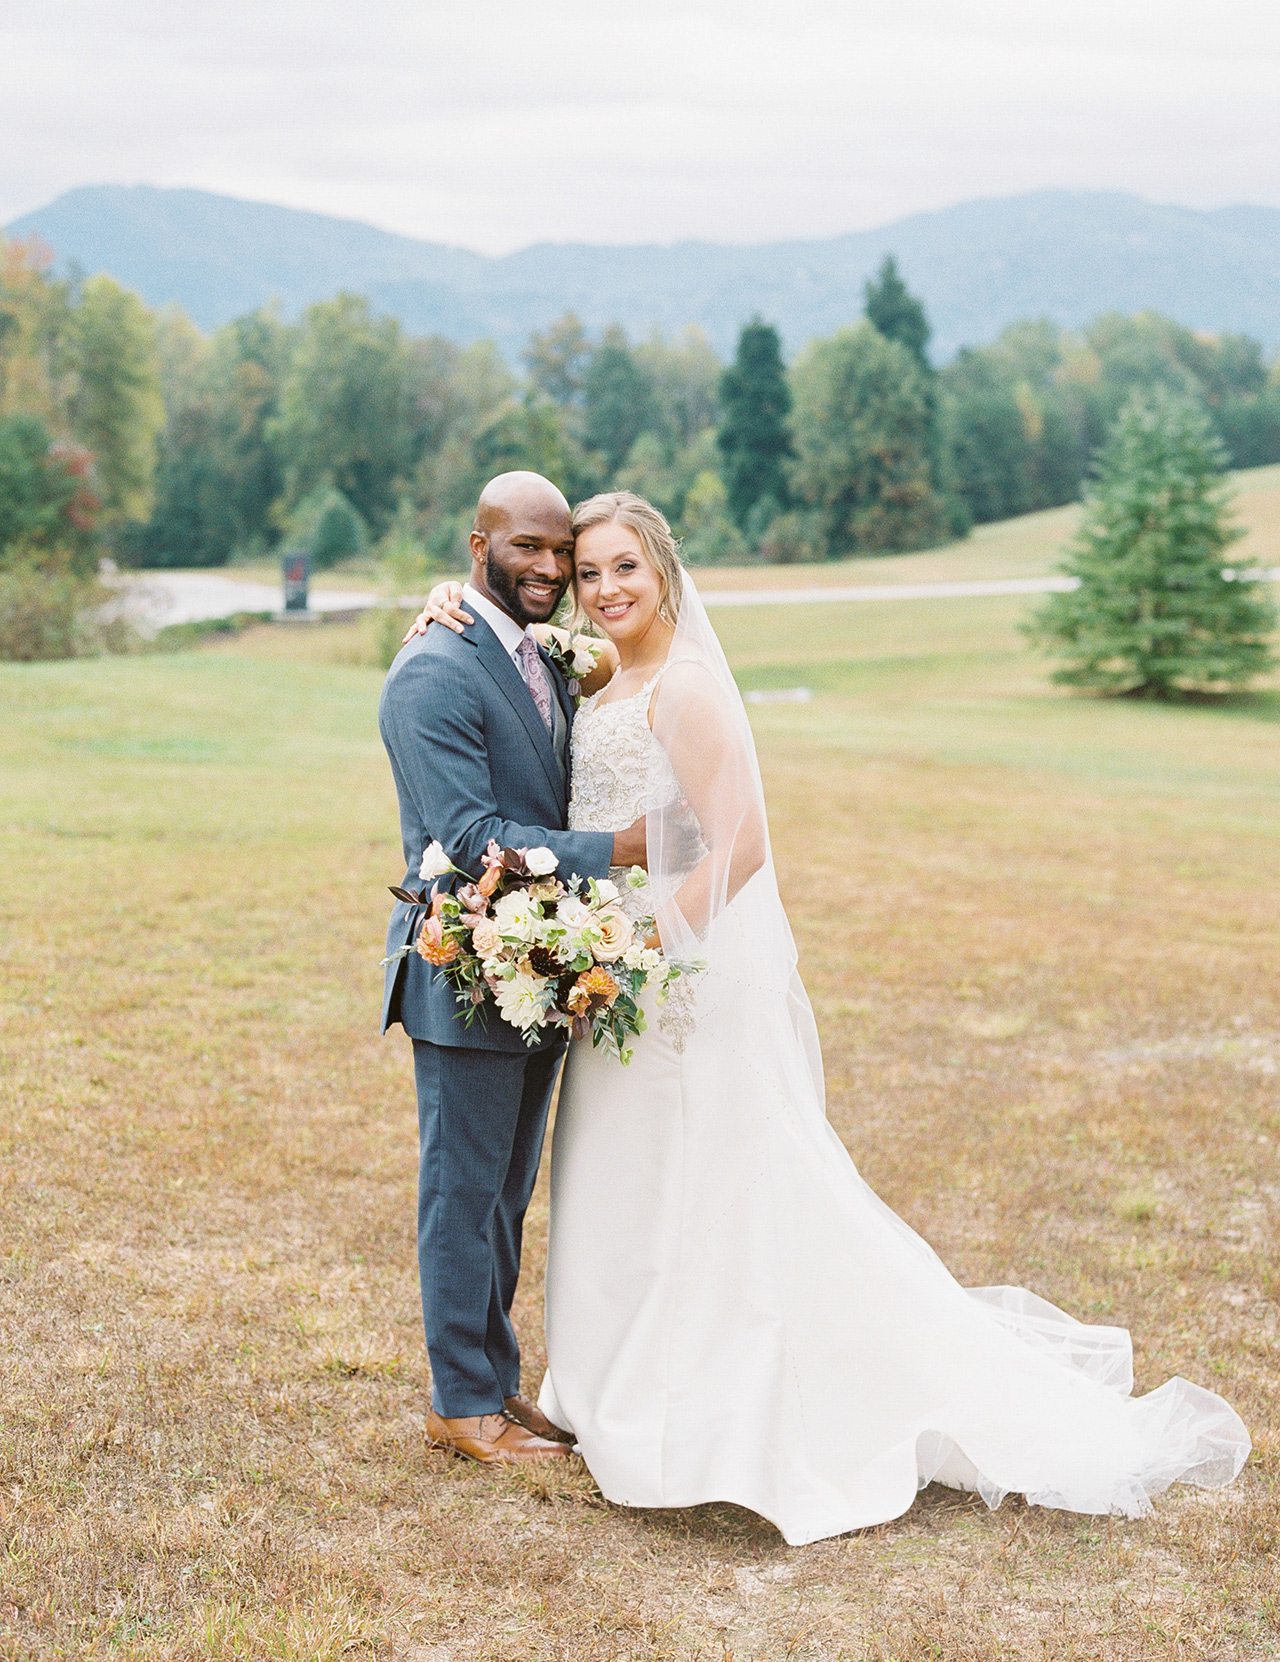 bride groom pose in wedding attire outdoor mountain view